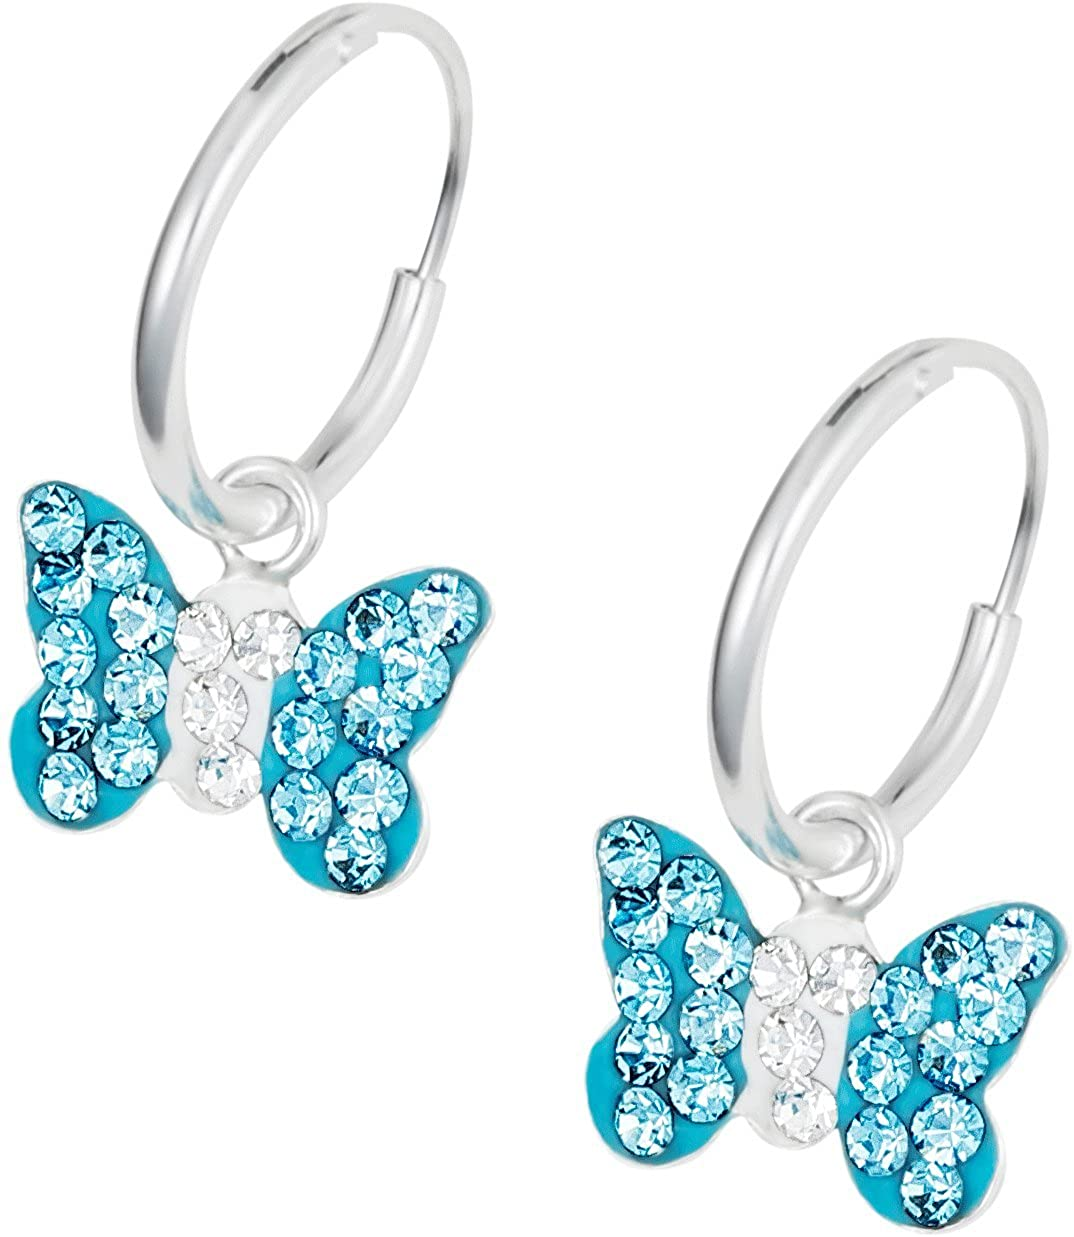 Hypoallergenic Sterling Silver Aqua Crystal Butterfly Hoop Earrings for Kids (Nickel Free) Penny & Piper PP-MN0276